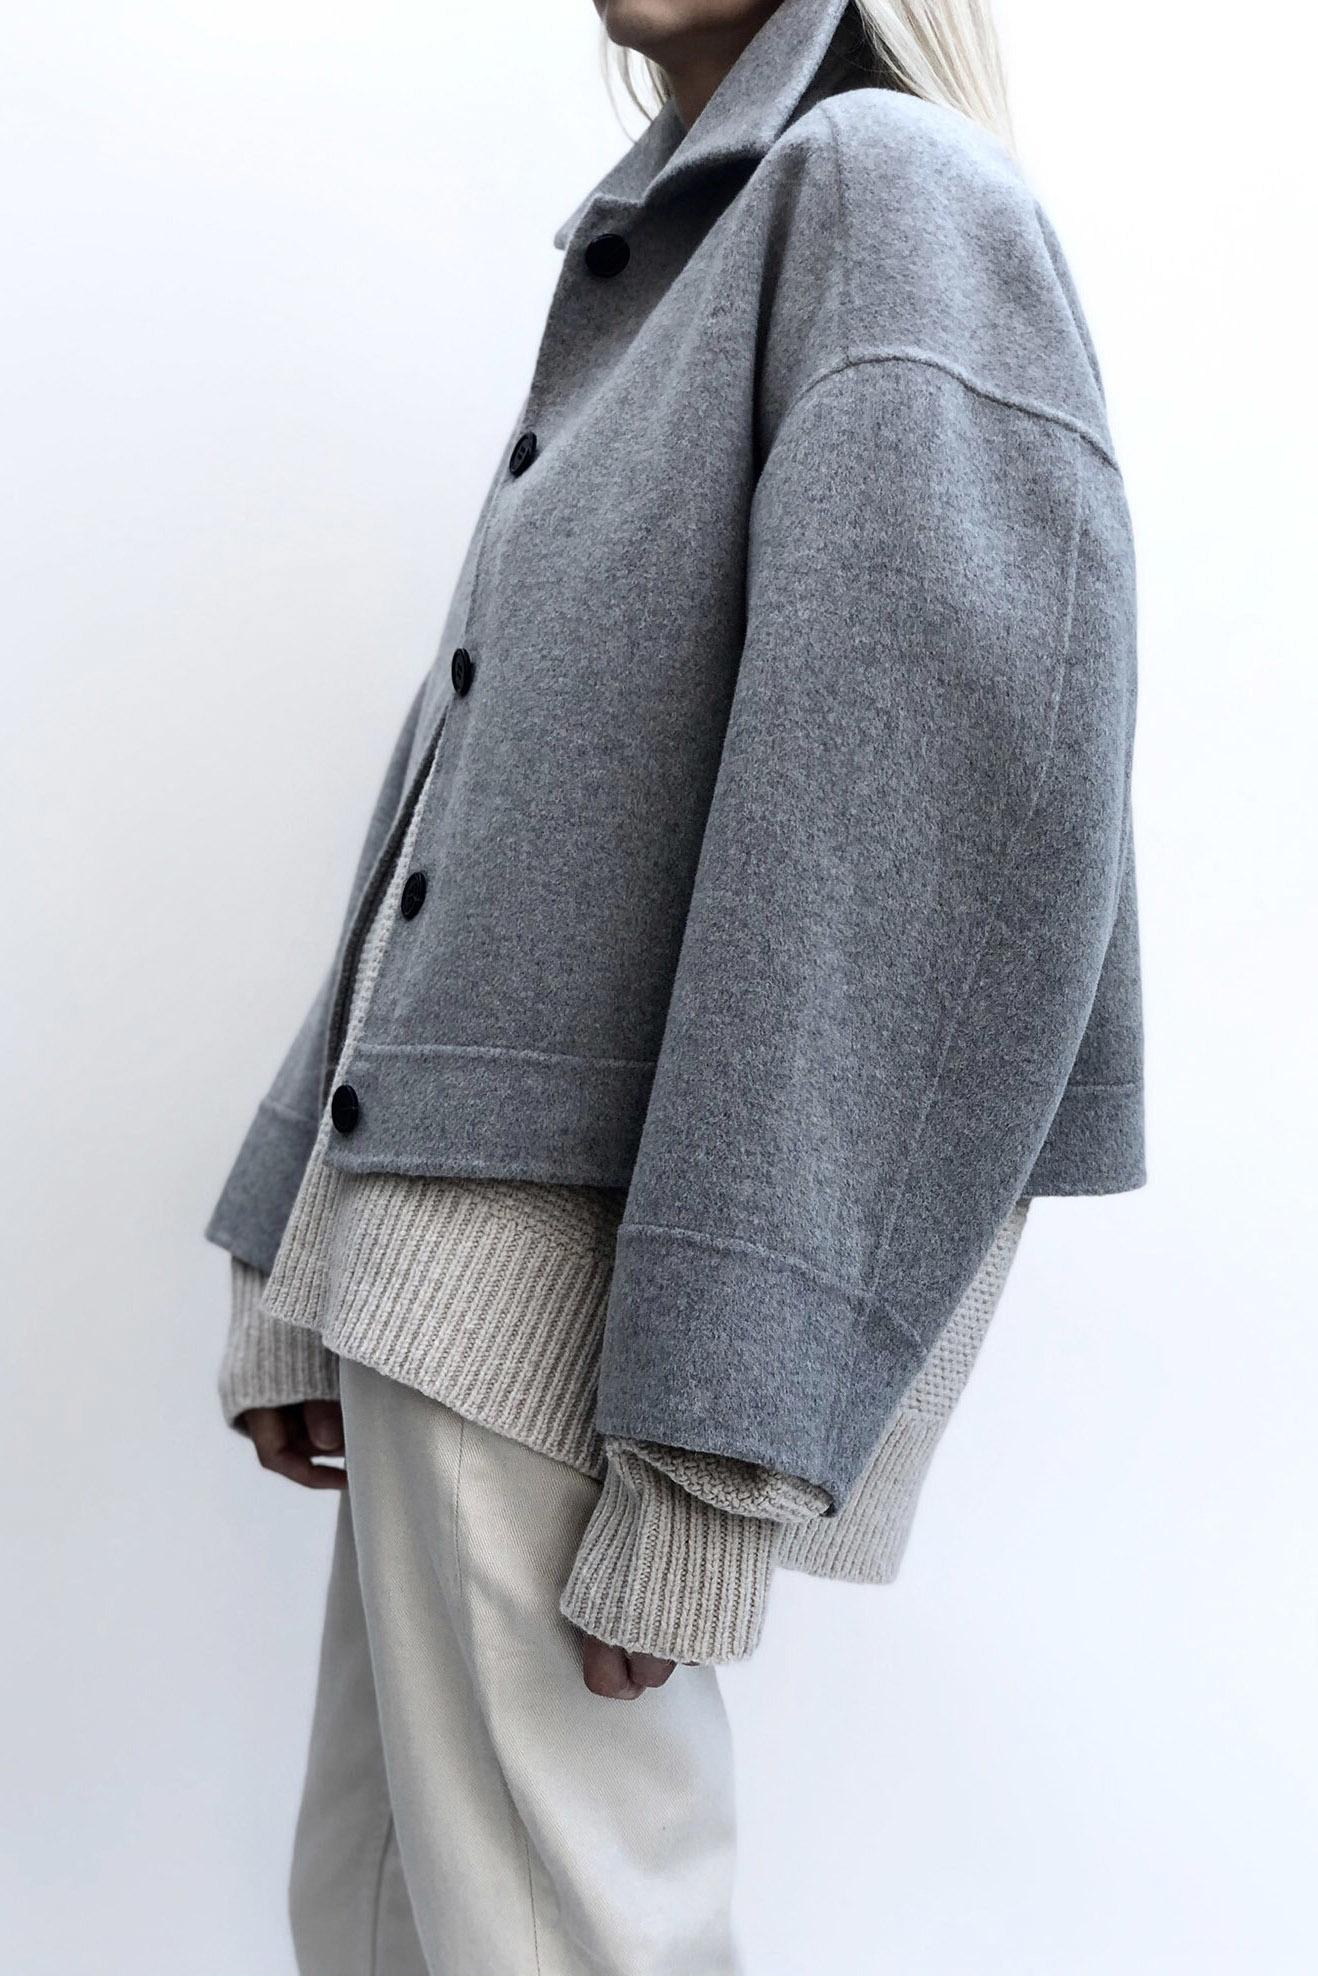 Andy Wool Jacket - Light Grey XS-5